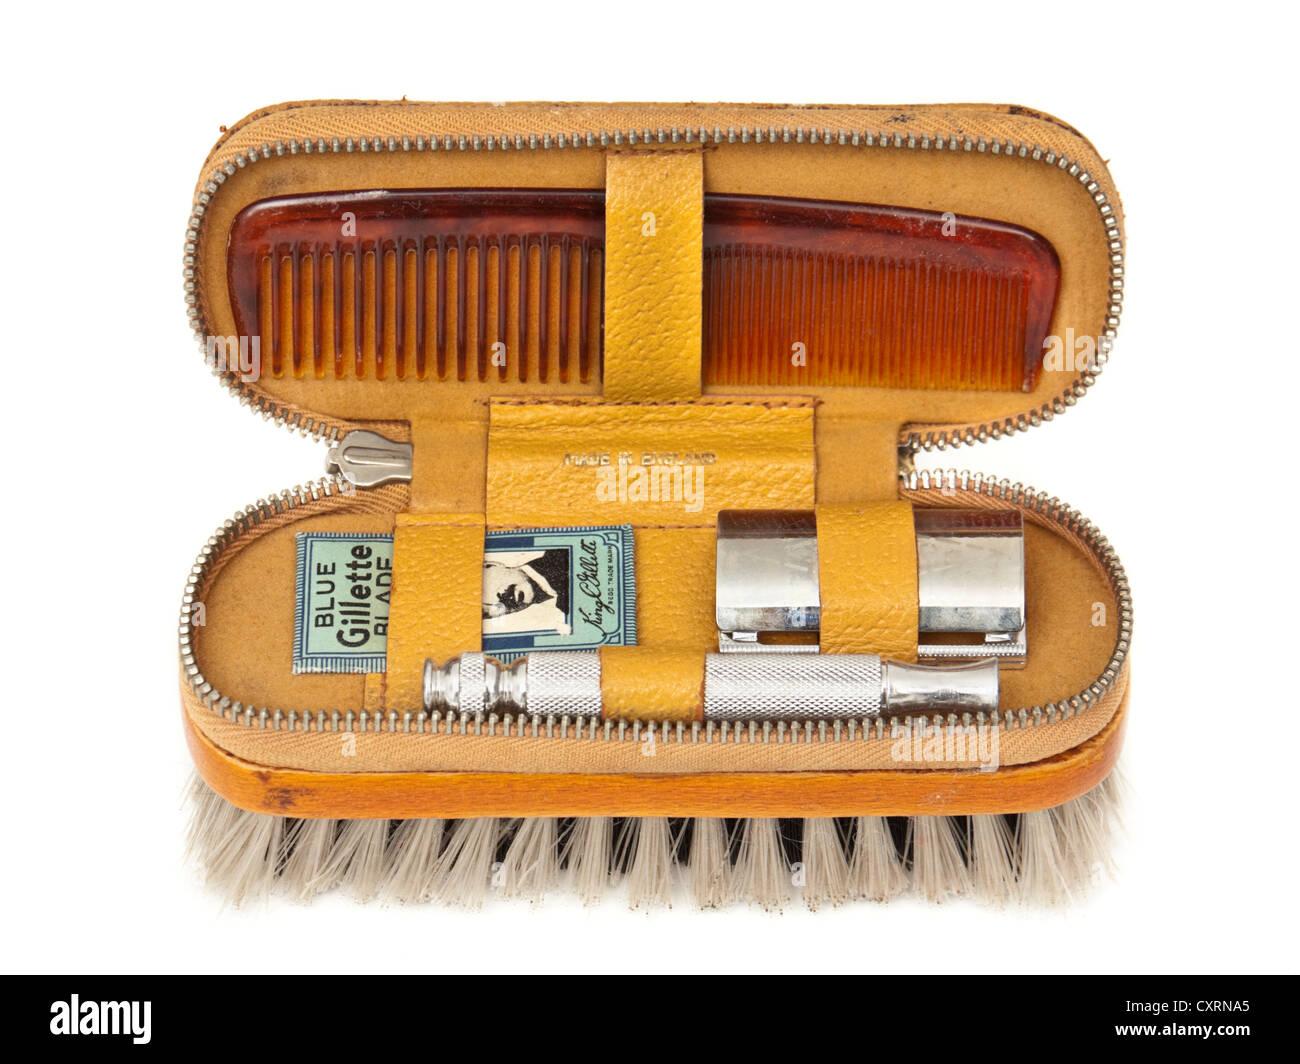 Old Fashioned Shaving Kit Australia